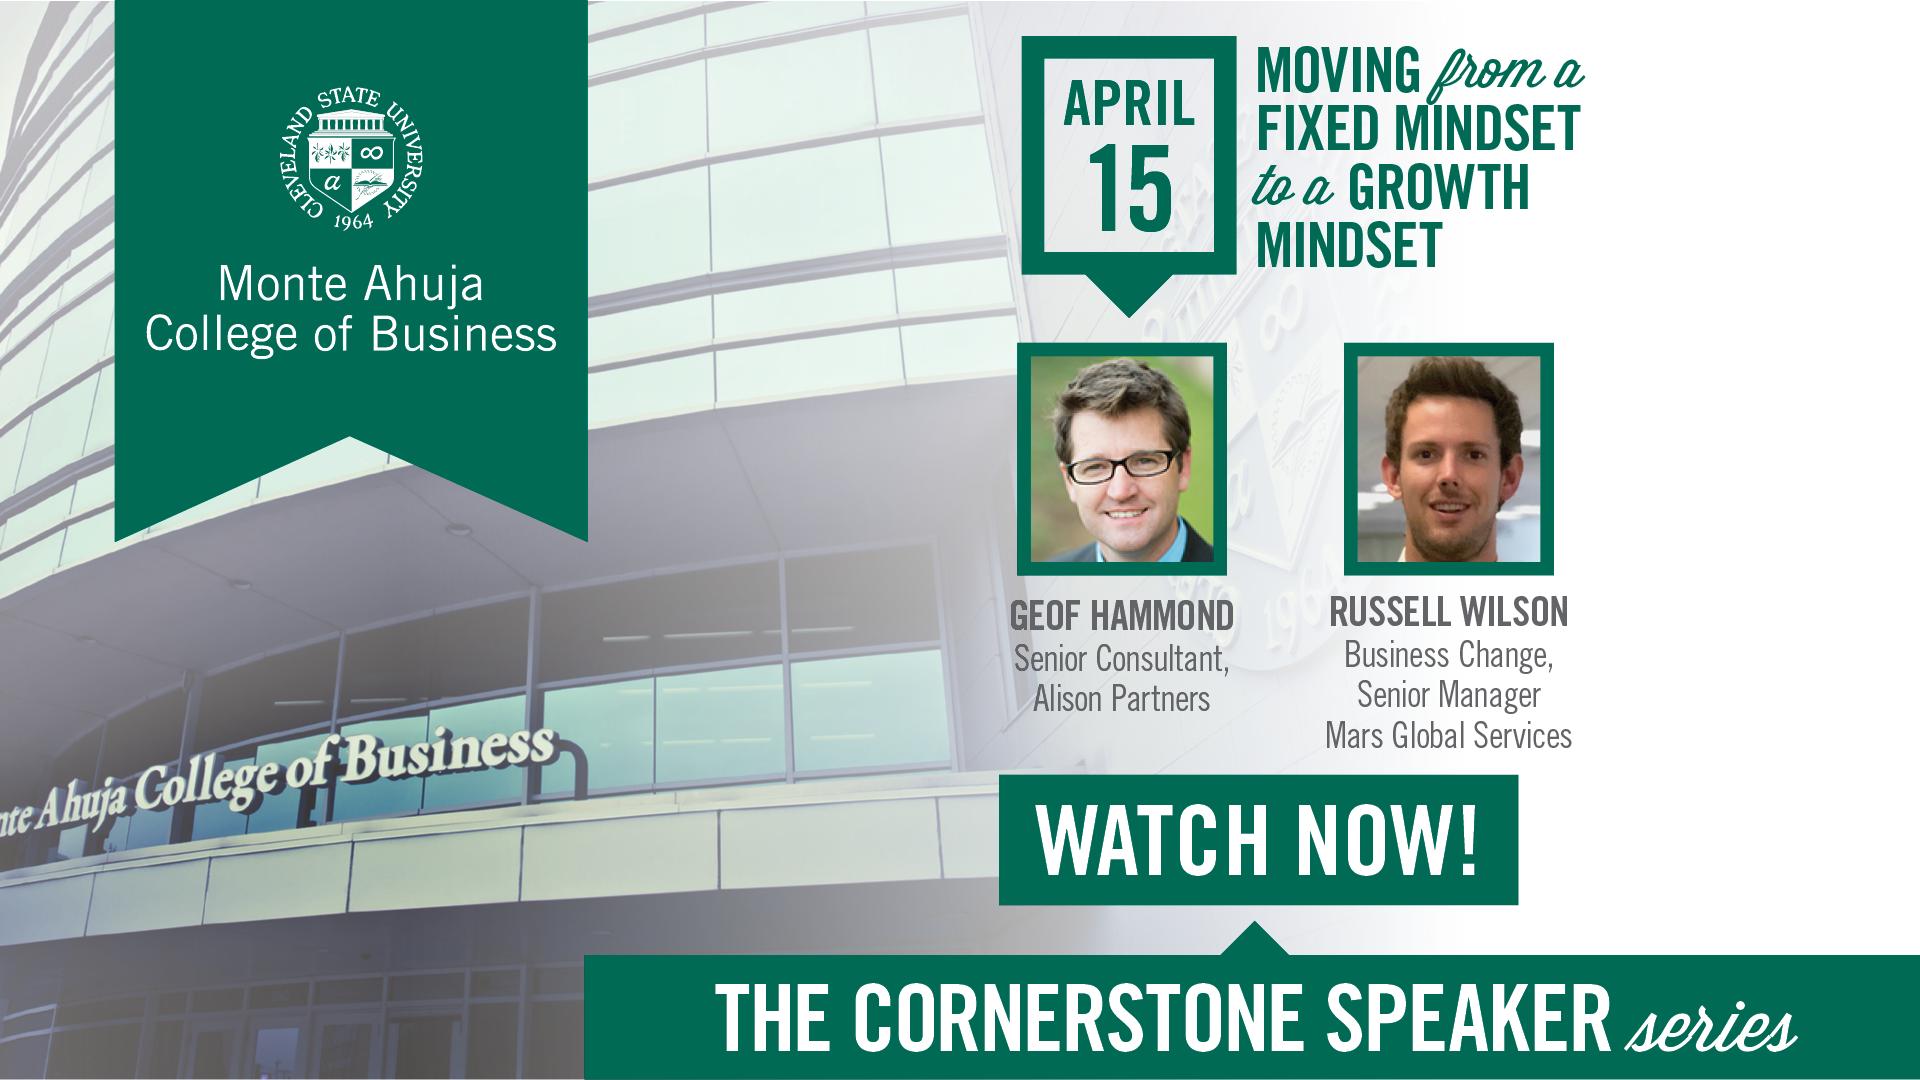 Cornerstone Speaker Series April 2021